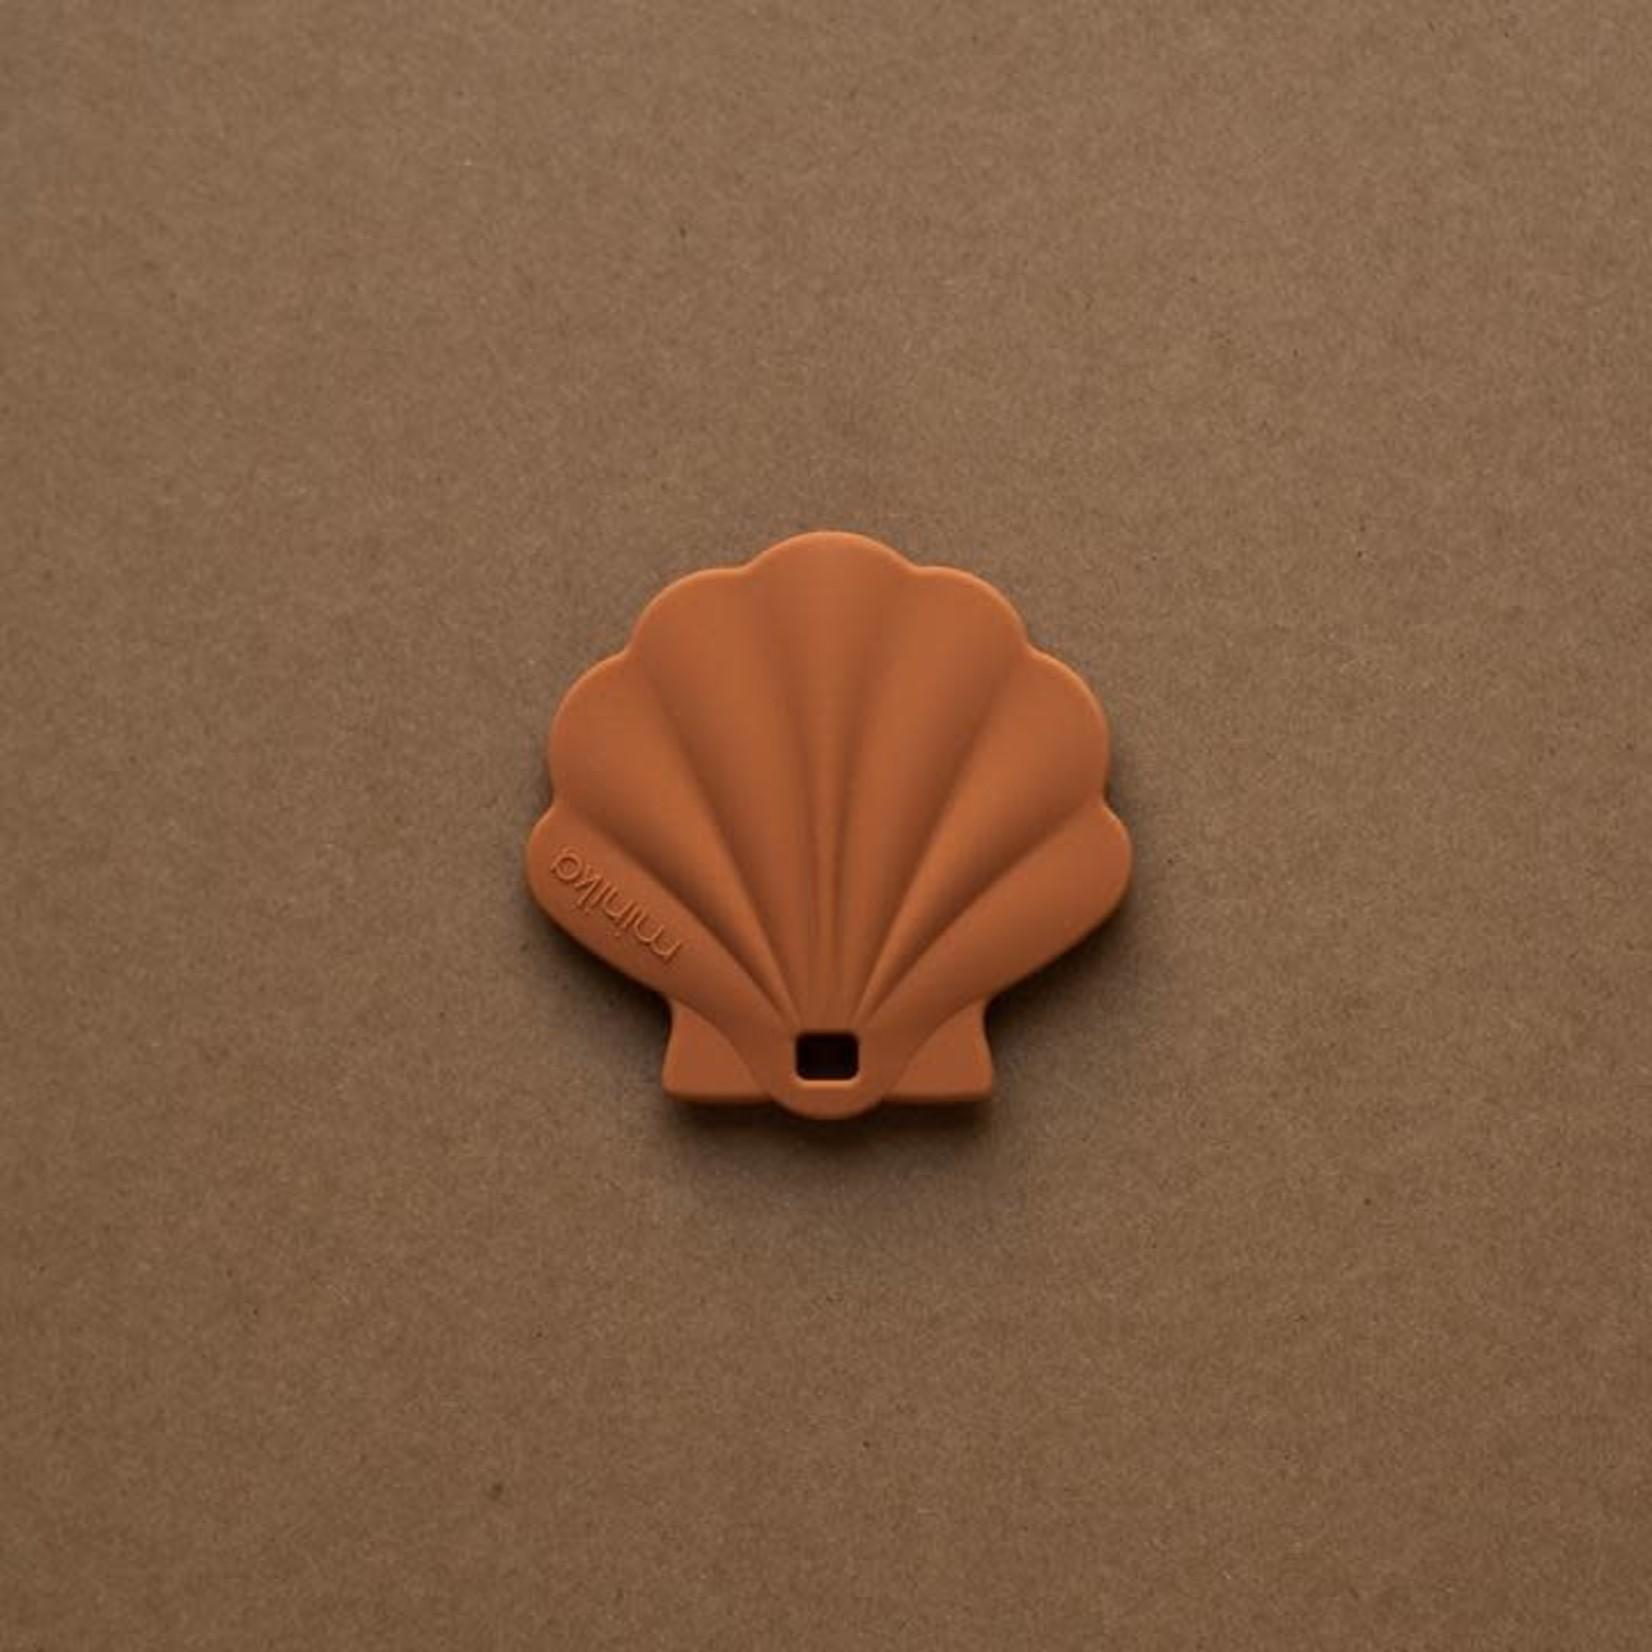 Minika Copy of Coquillage de dentition blush